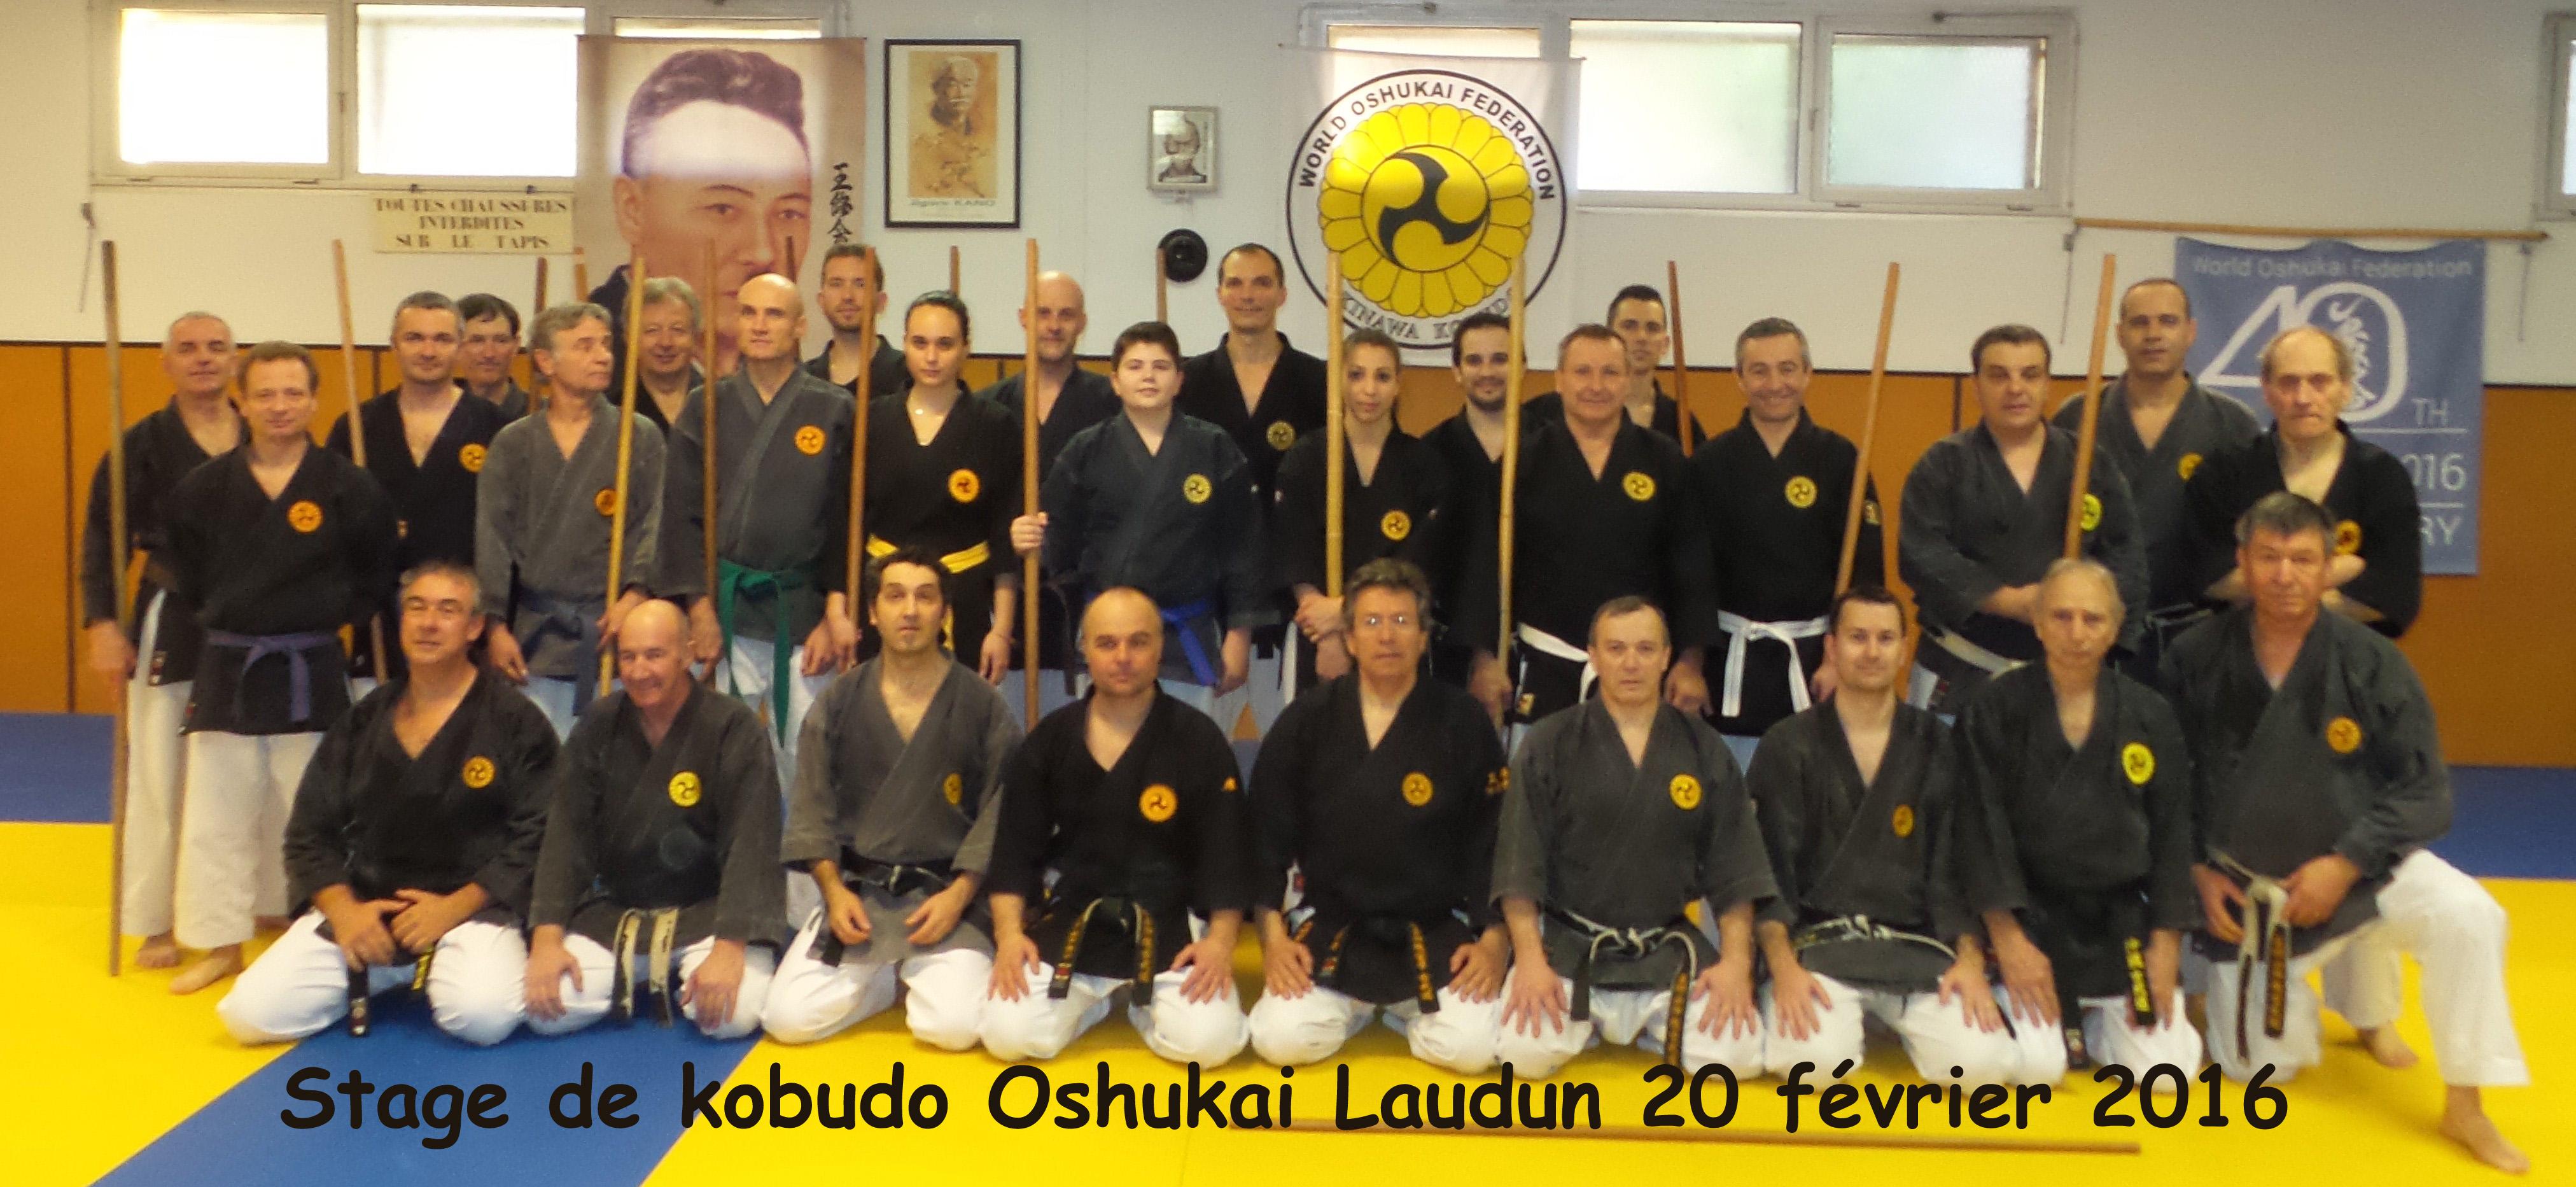 Stage kobudo du 20 février 2016 à Laudun